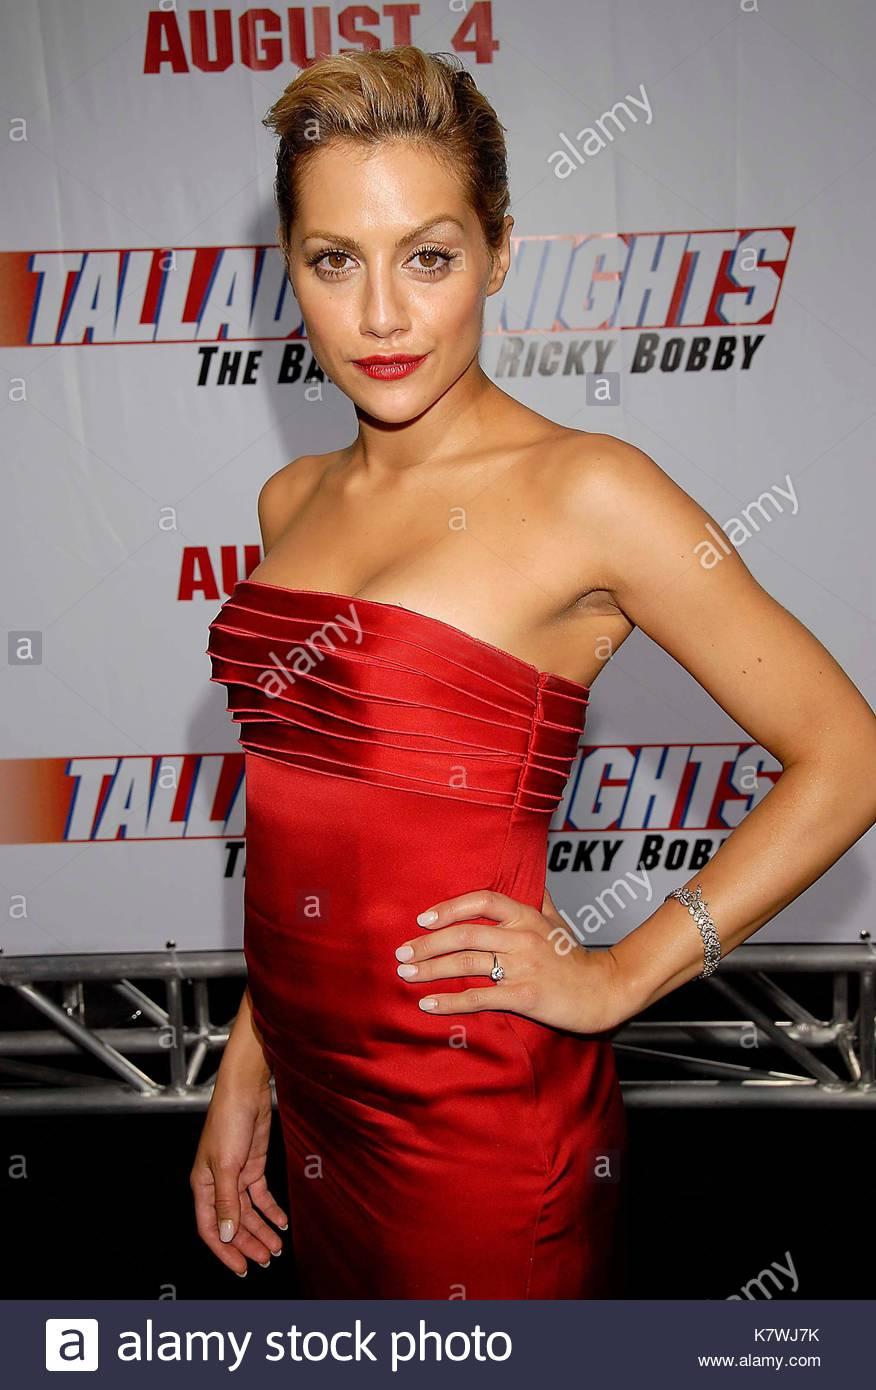 Brittany Murphy Red Dress Silk Red Silk Strapless Blonde Hair